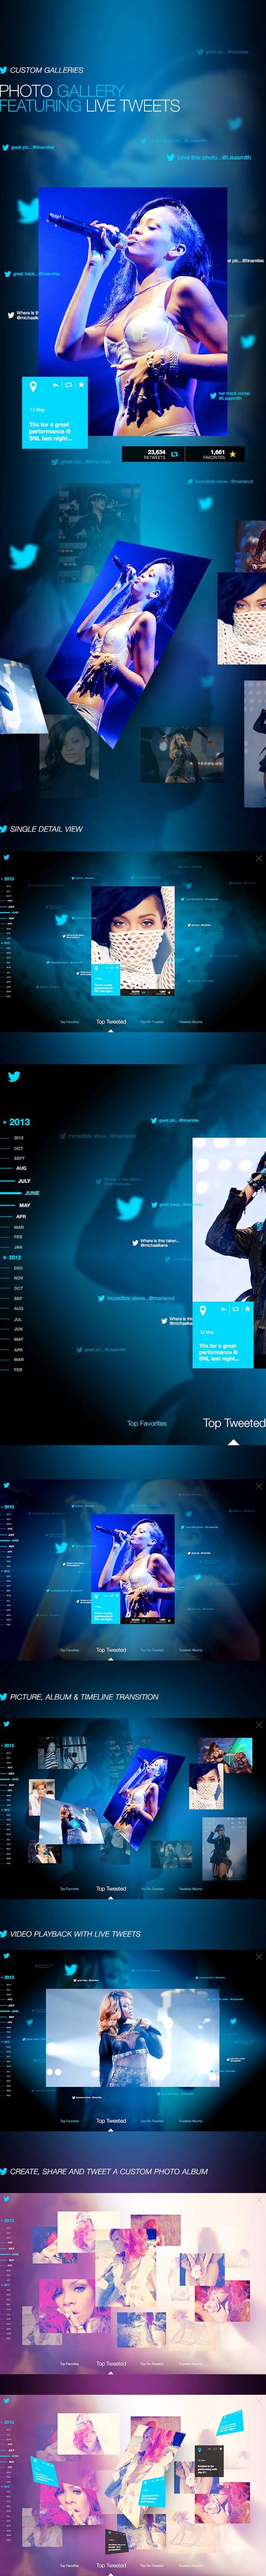 twitter-redesign-4